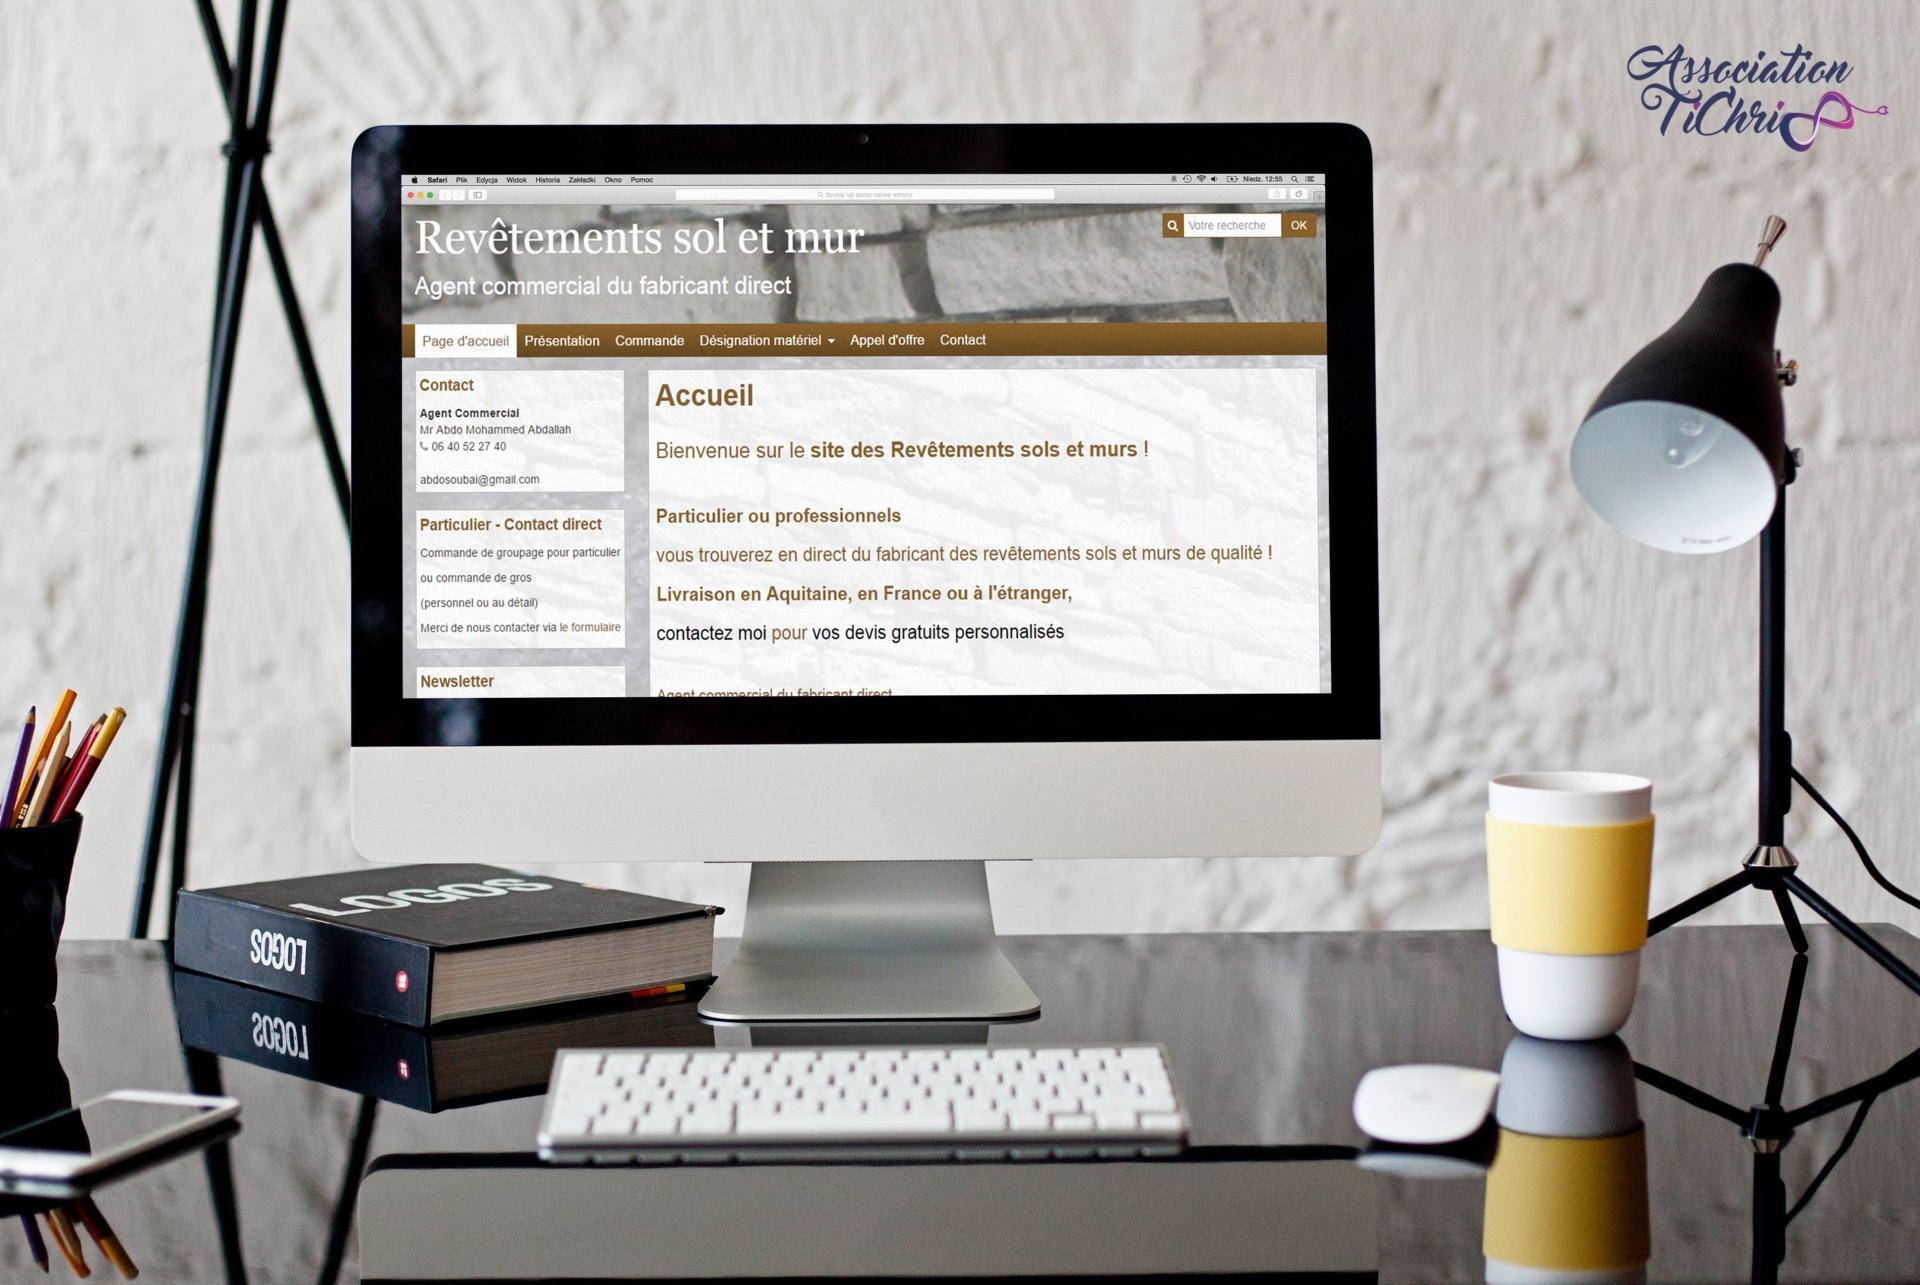 Centre de formation site web tichri28